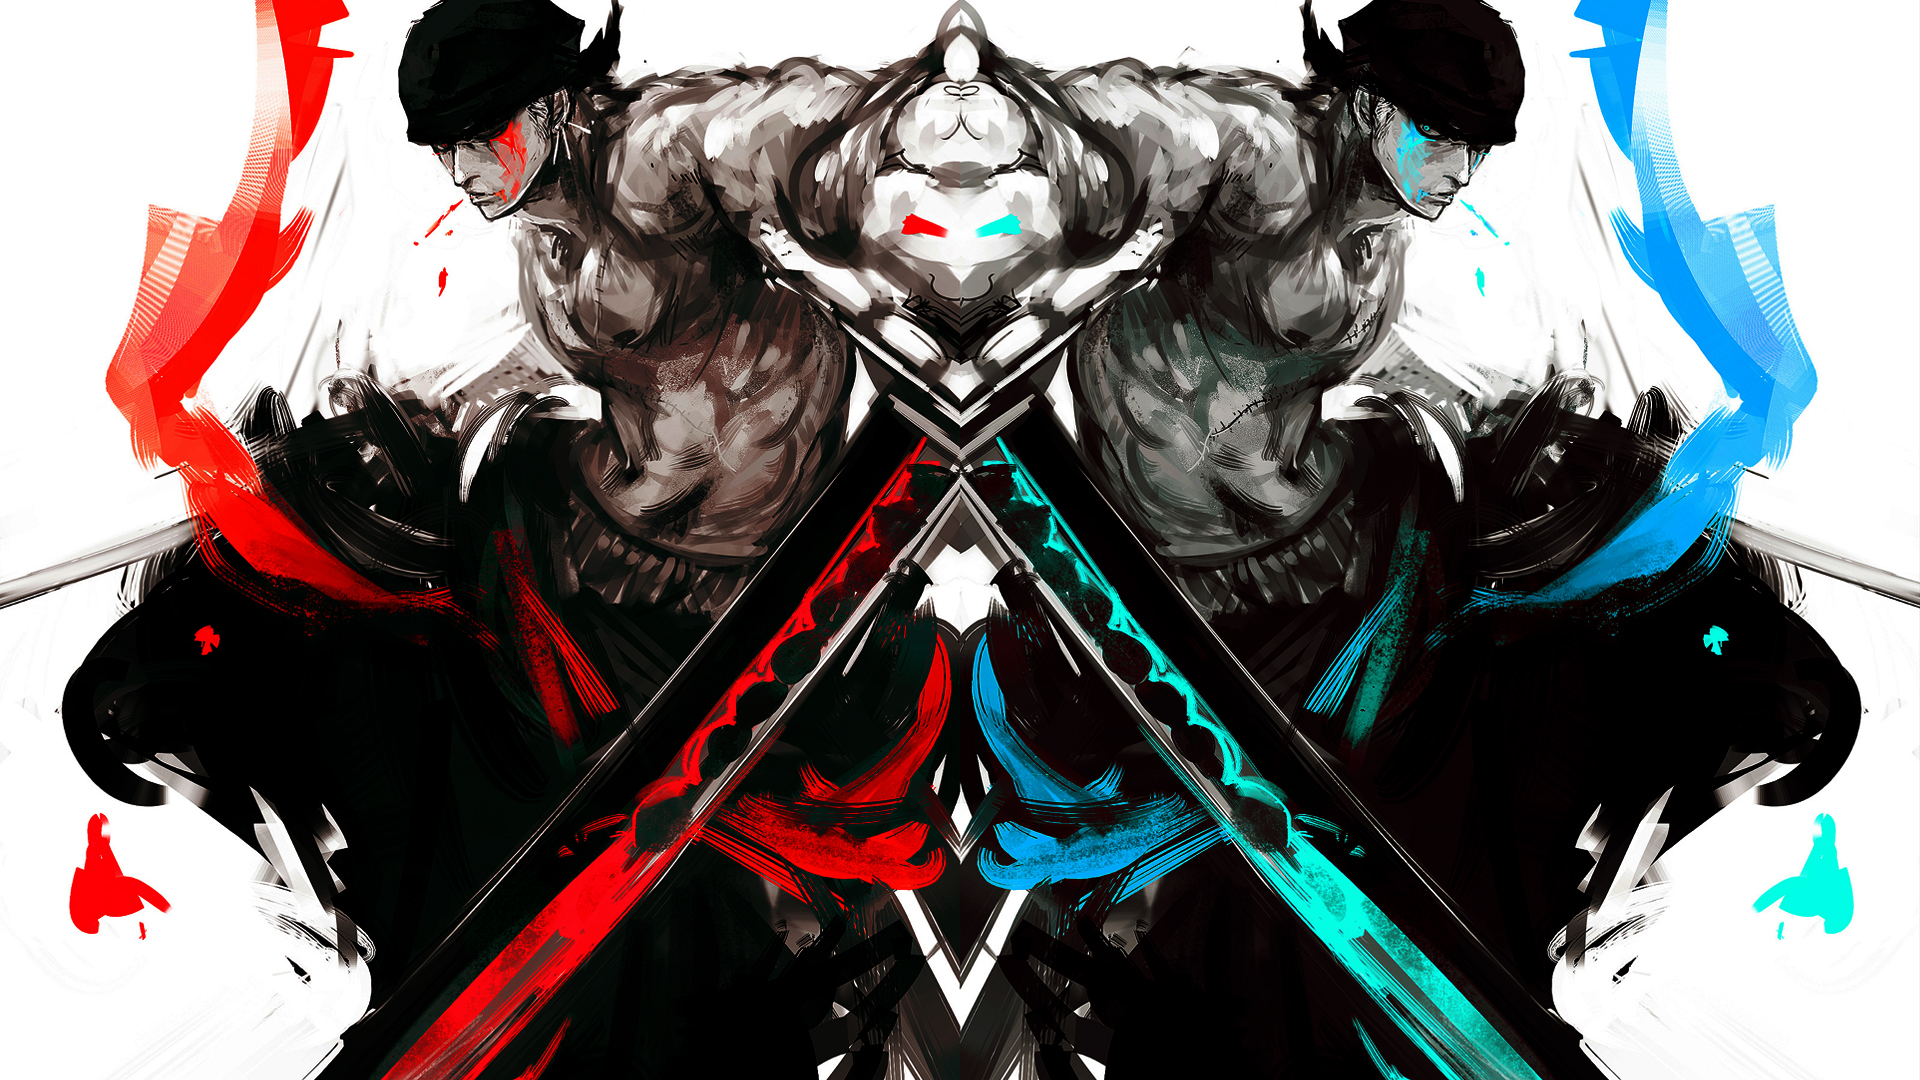 roronoa zoro one piece anime hd 1920x1080 1080p wallpaper and 1920x1080